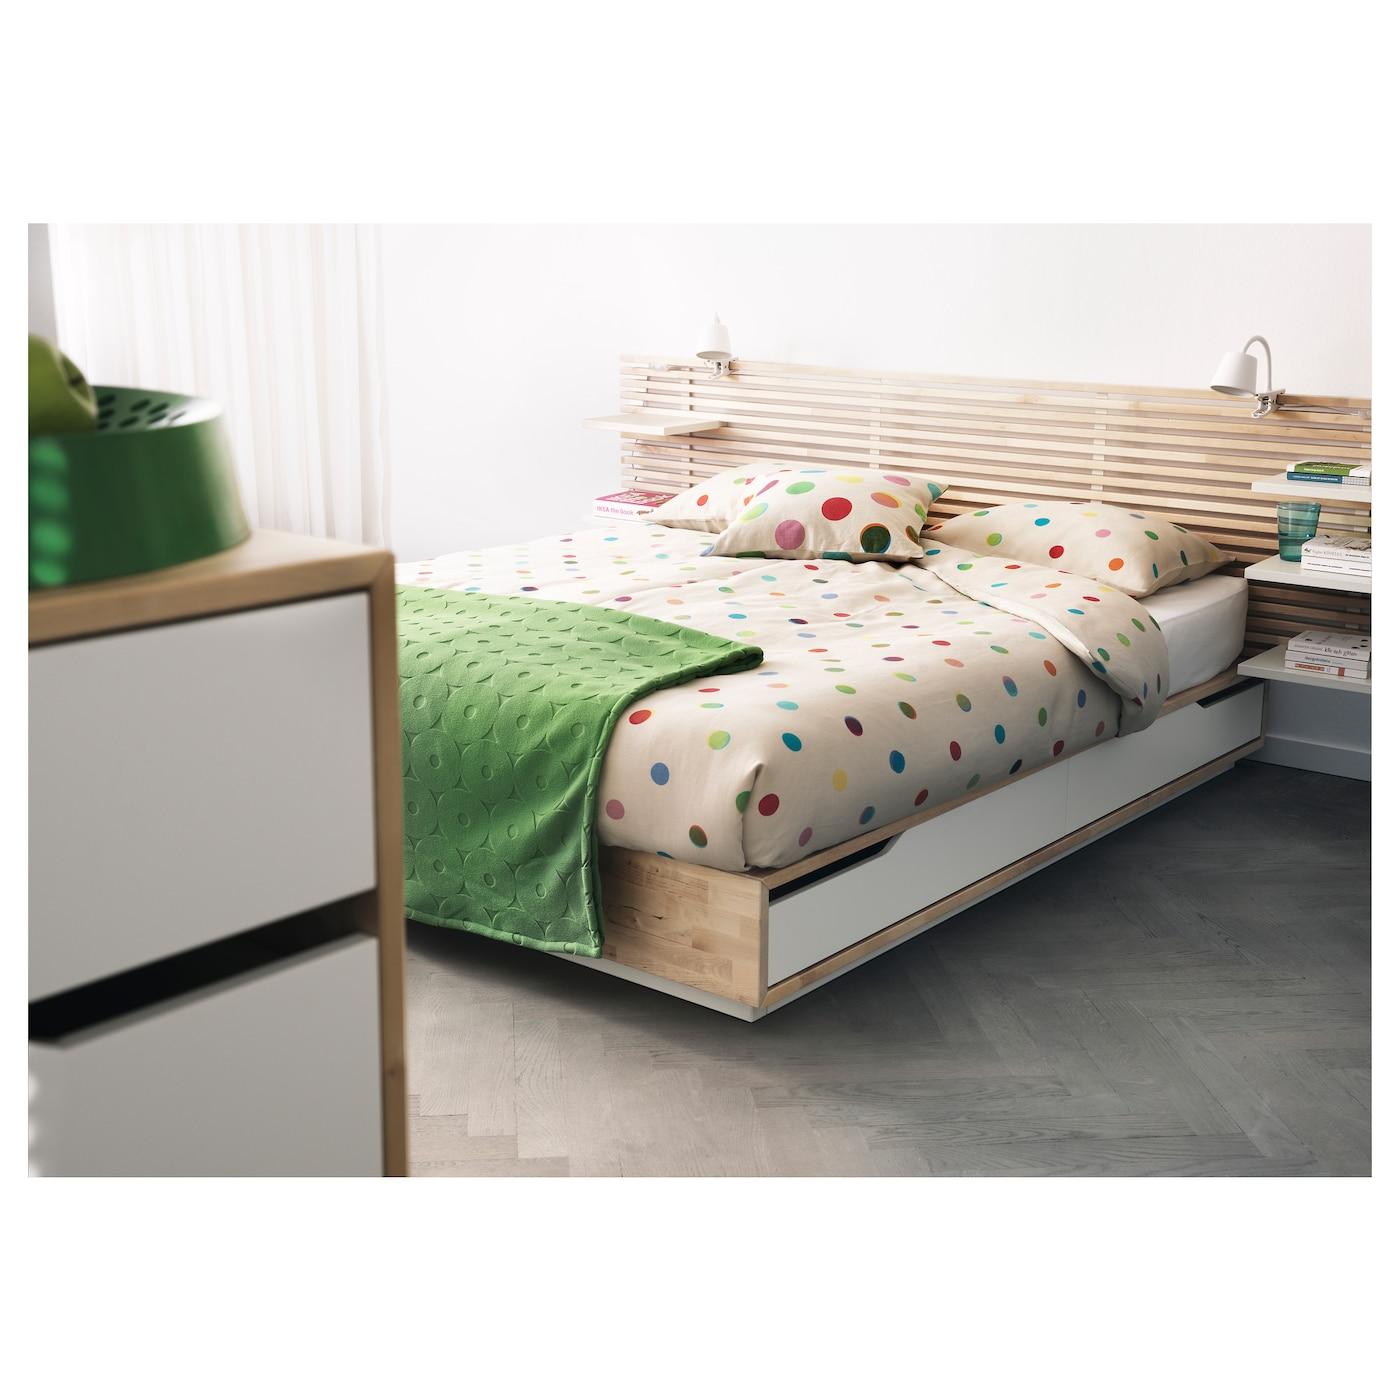 mandal bed frame with headboard birch white 160x202 cm ikea. Black Bedroom Furniture Sets. Home Design Ideas